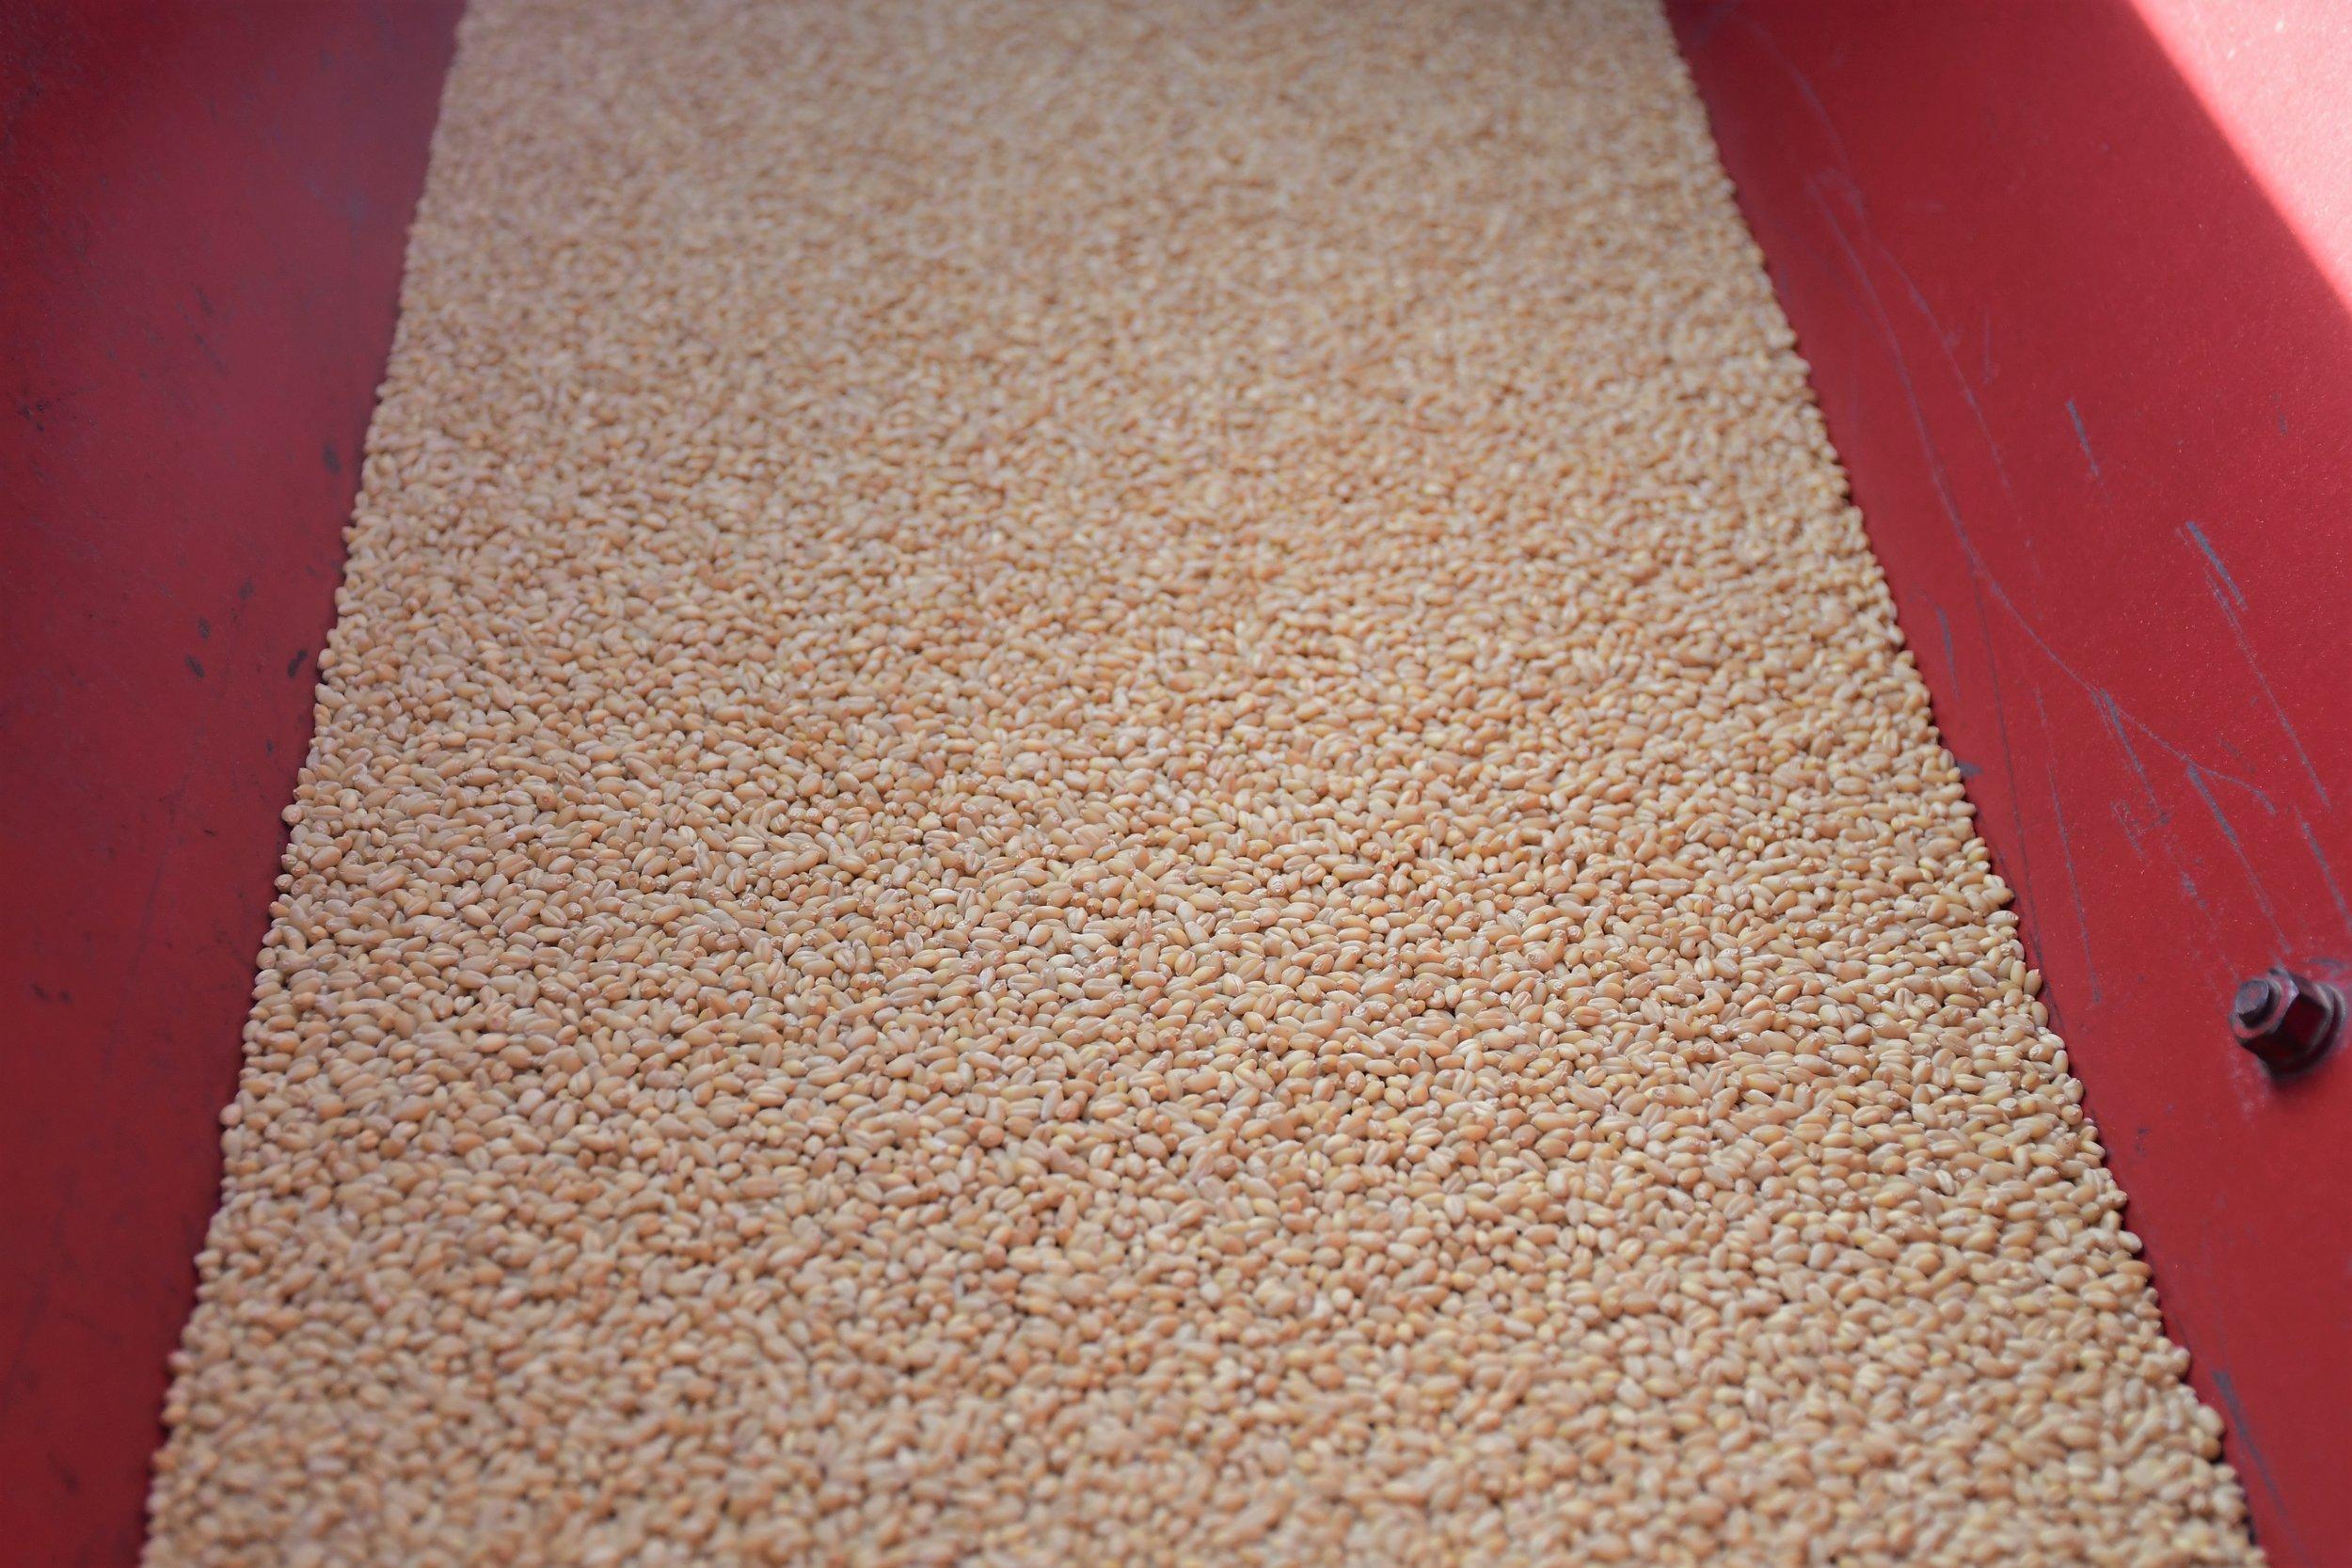 Sonora Wheat Berries 2.jpg